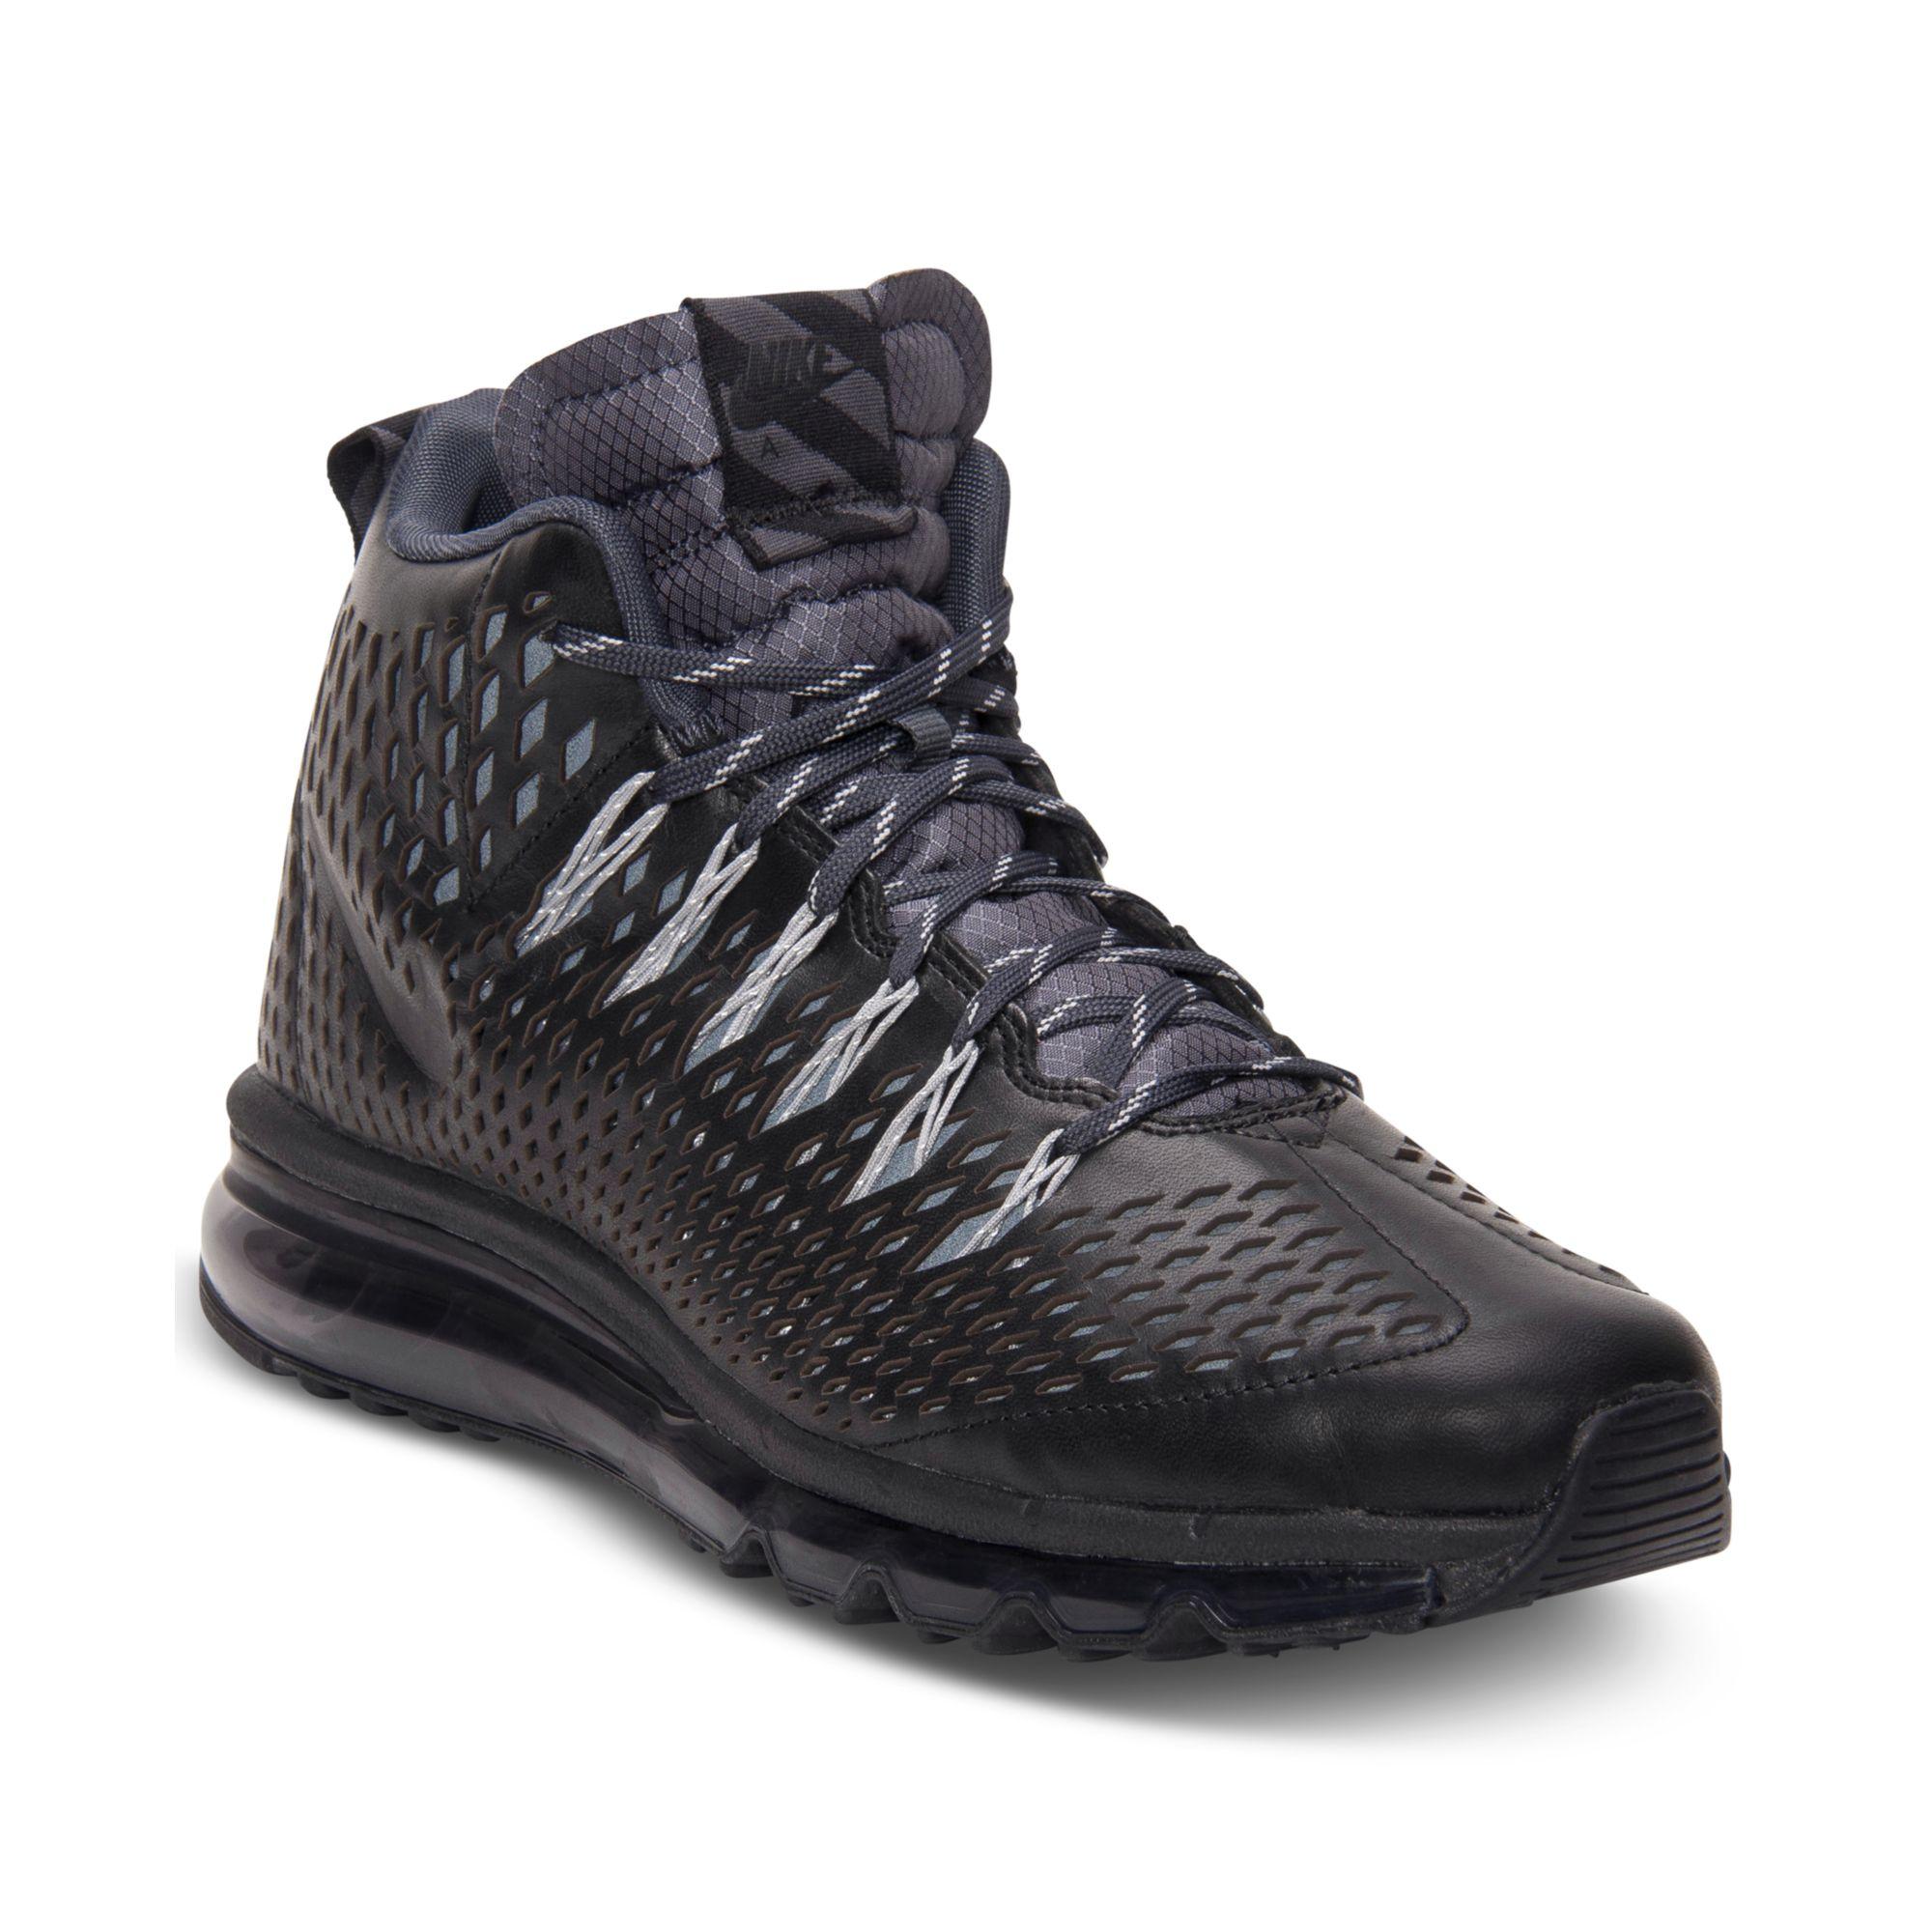 online retailer 22ba2 06dd4 Nike Air Max Graviton Casual Sneakers in Black for Men - Lyst